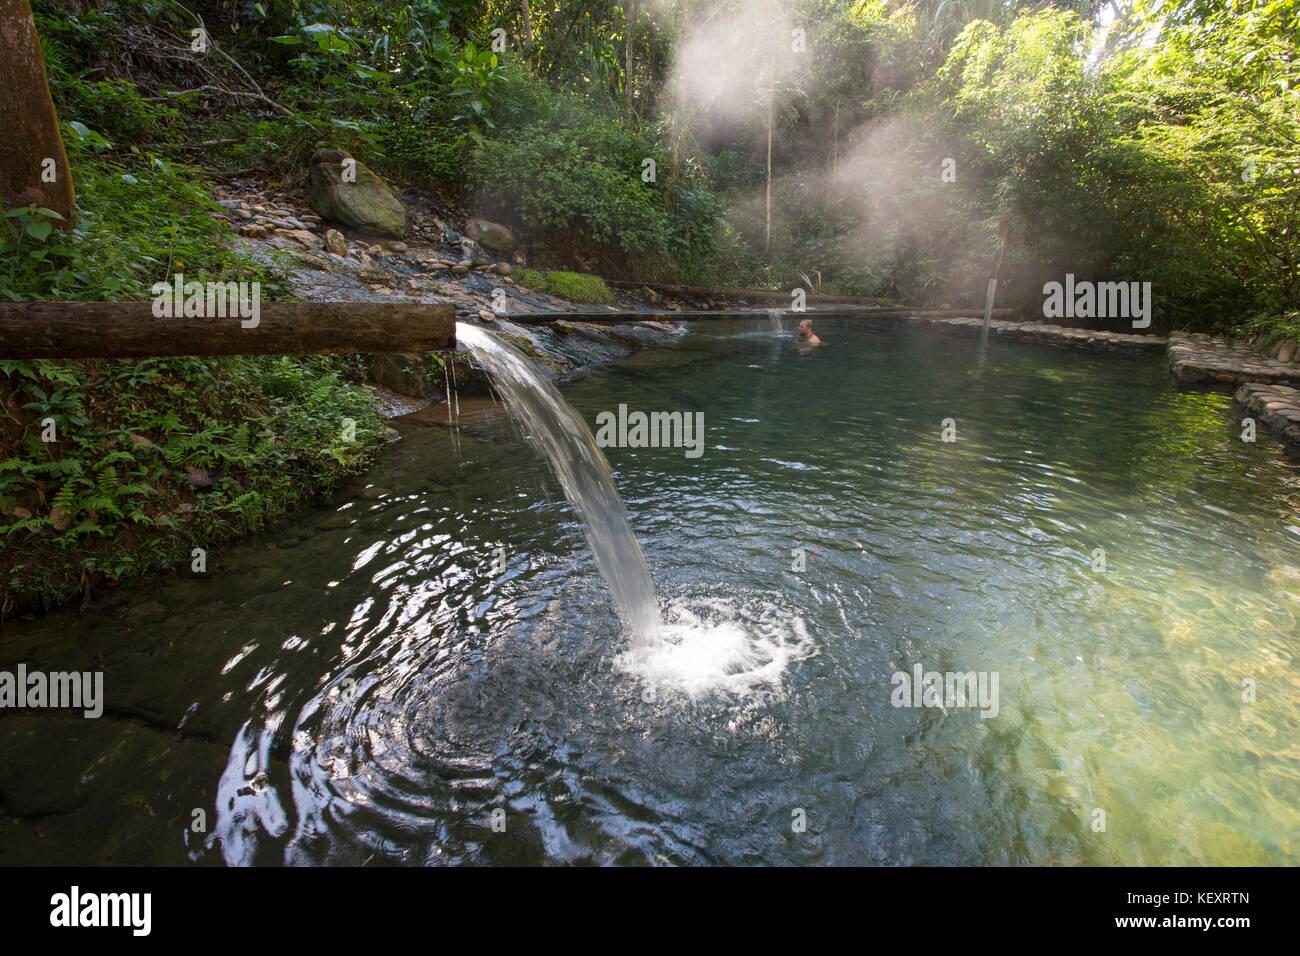 Natural hot springs pool in the jungle of Manu National Park, Peru. - Stock Image